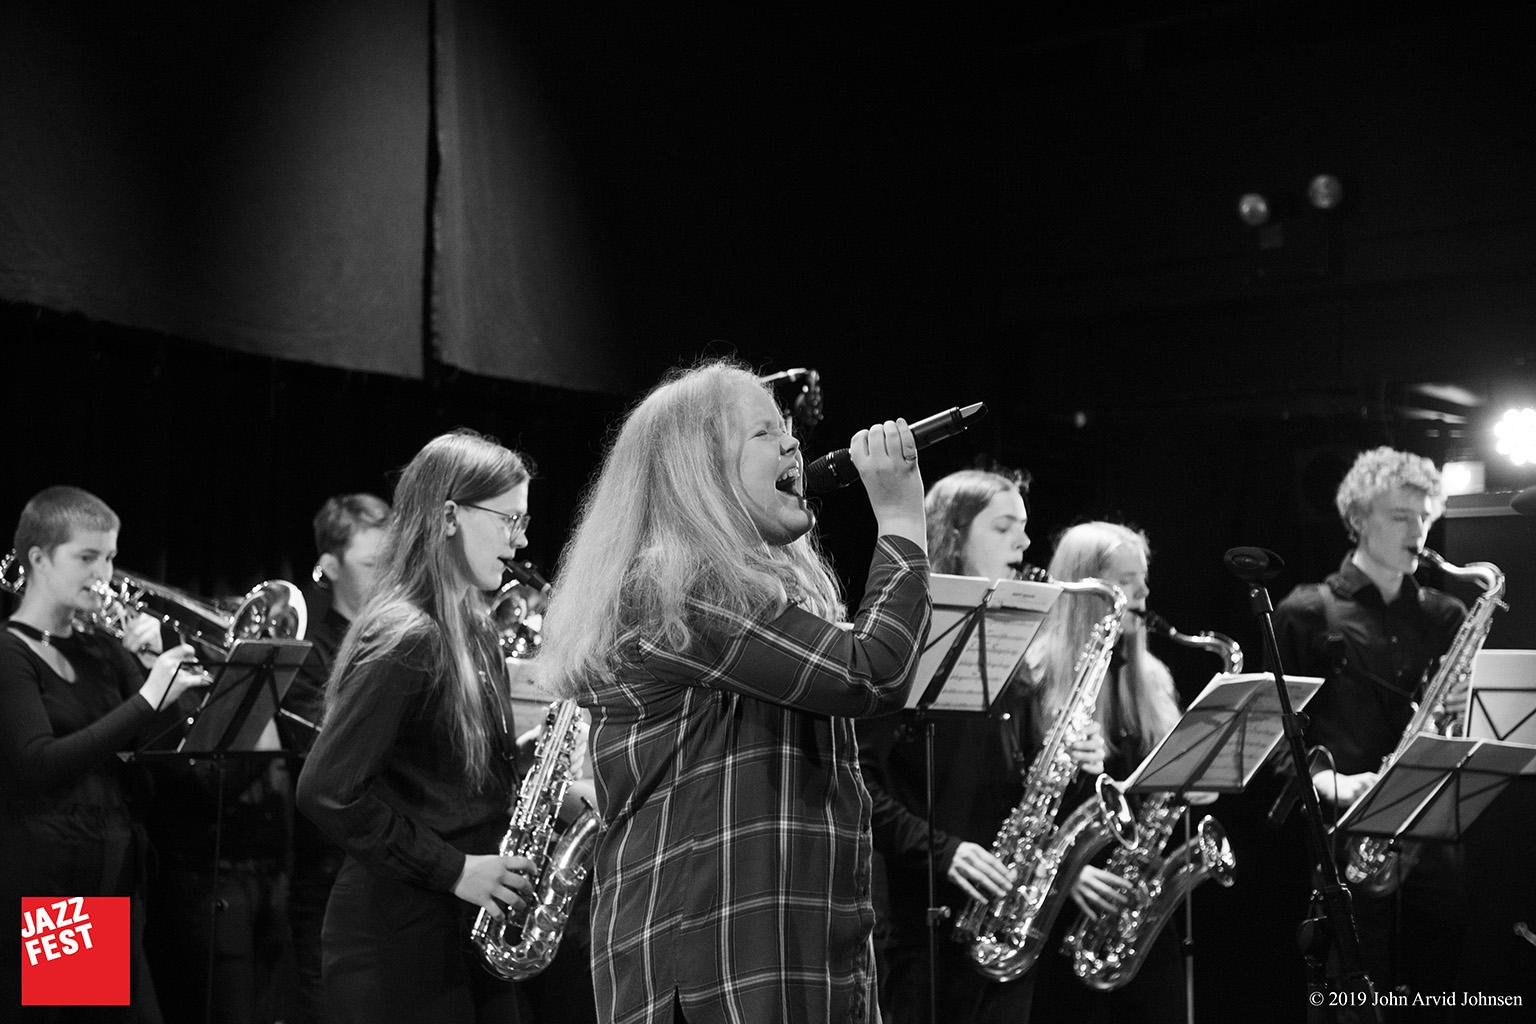 190511 Jazzfest Ung @ Isak Kultursenter (foto John Arvid Johnsen) _ 2.jpg